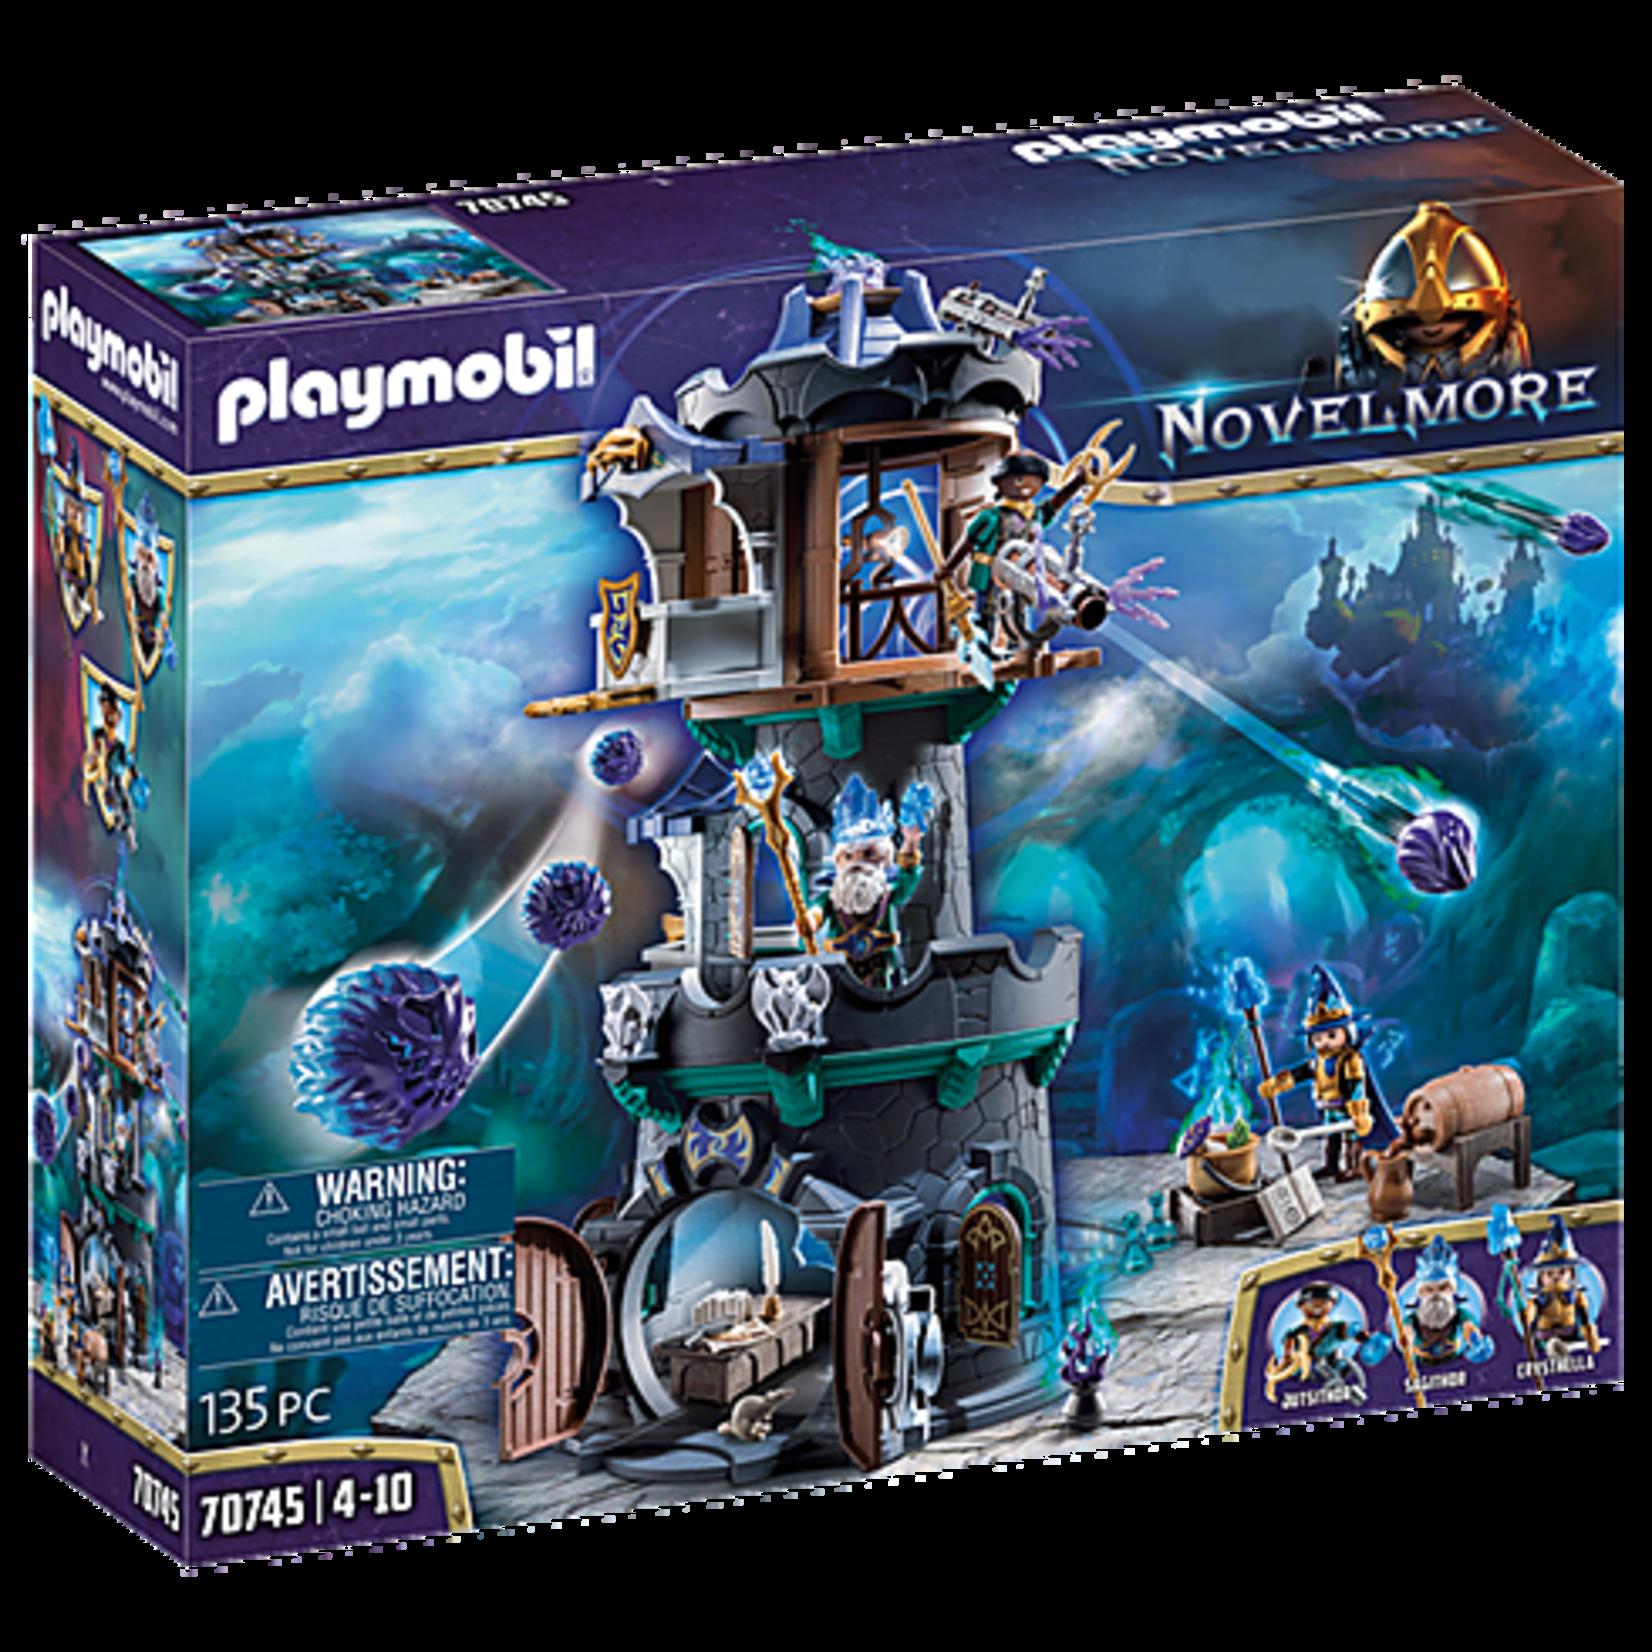 Playmobil Violet Vale - Wizard Tower - Playmobil 70745